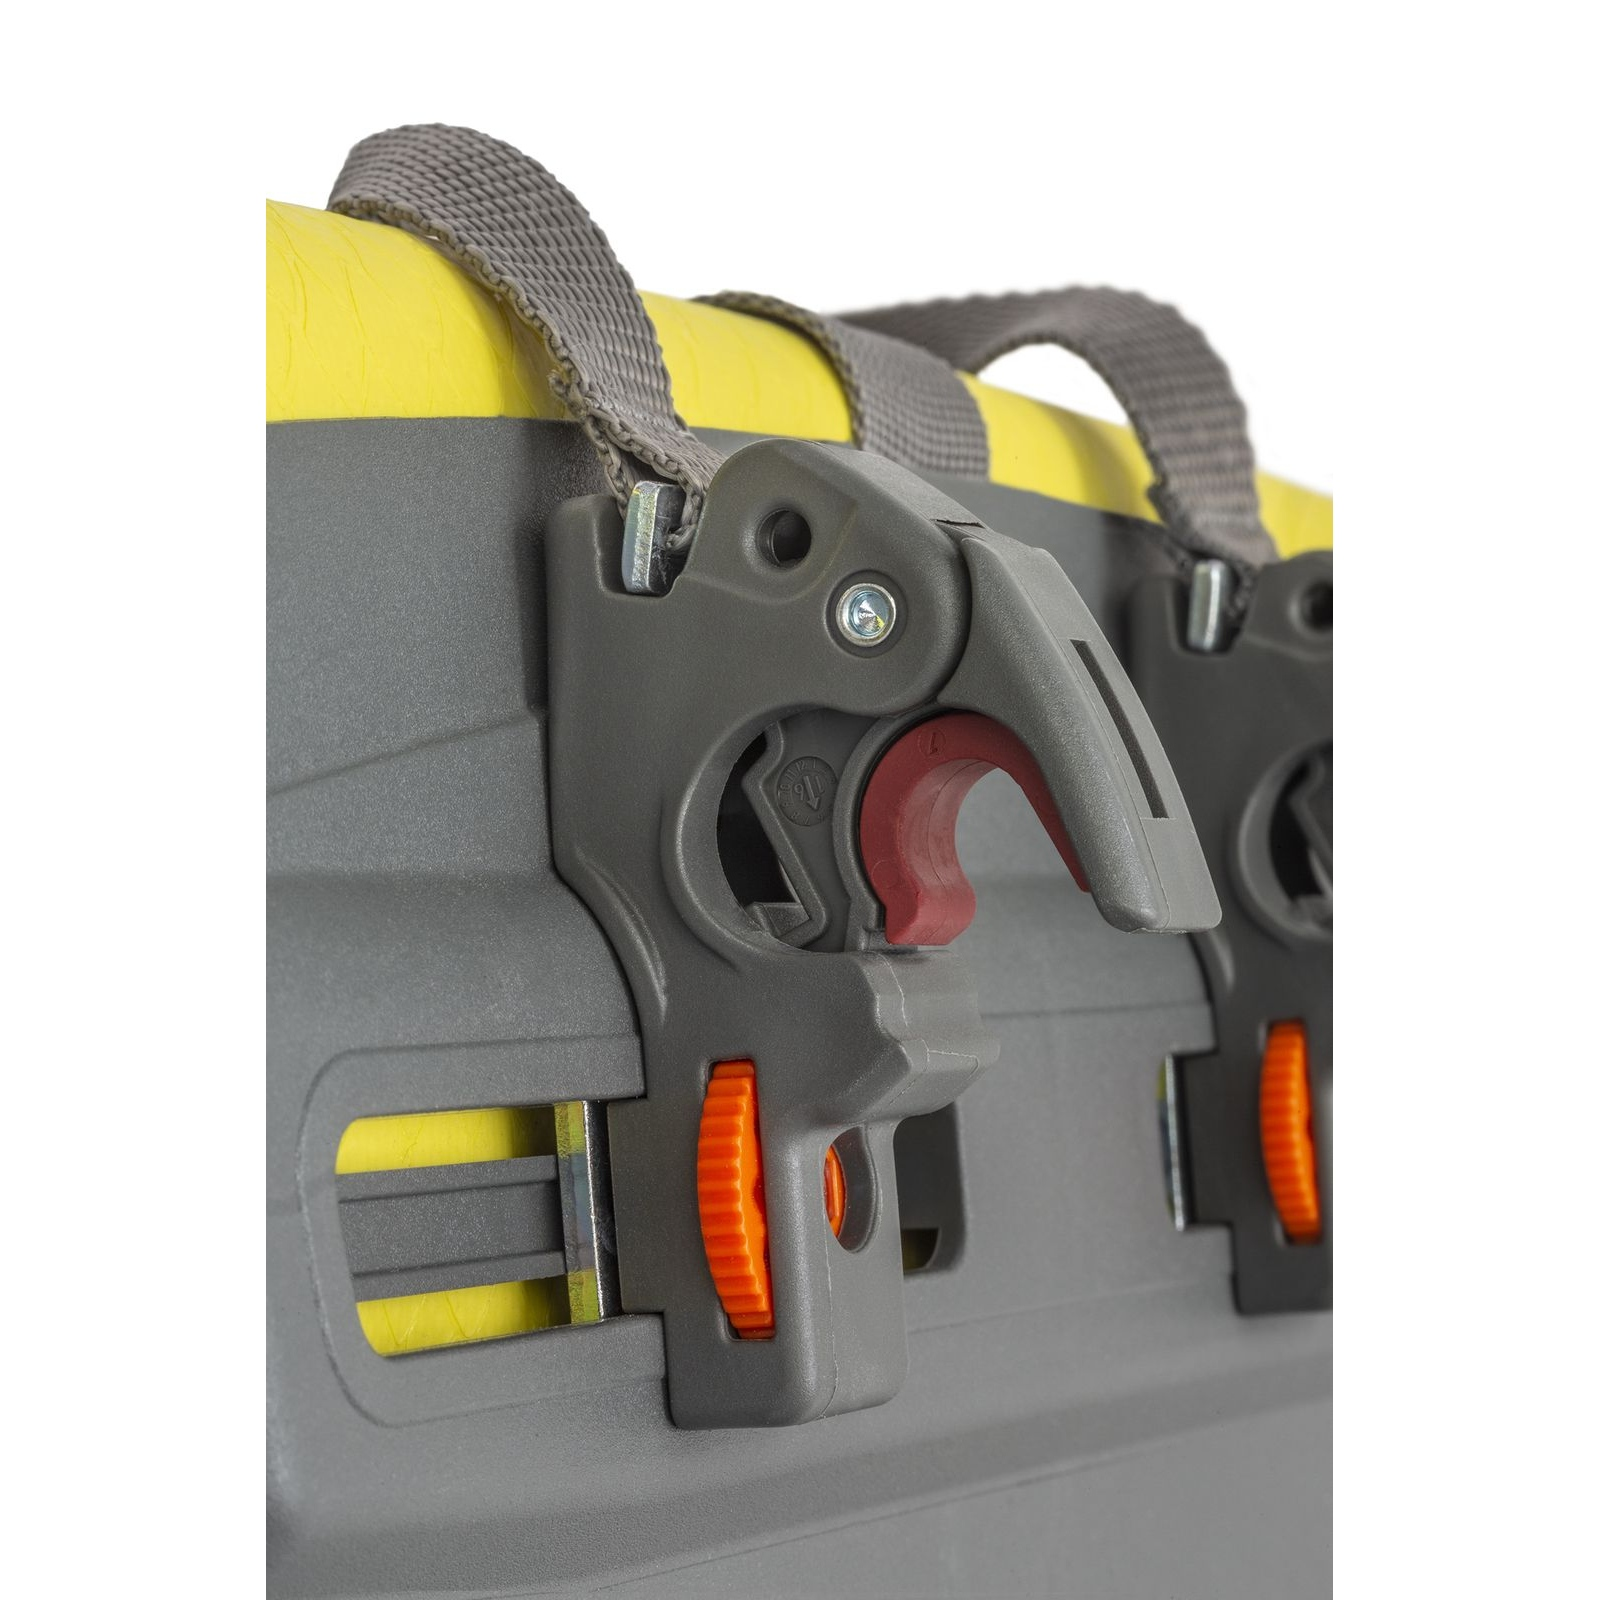 Image of Vaude QMR Reduction parts 2.0